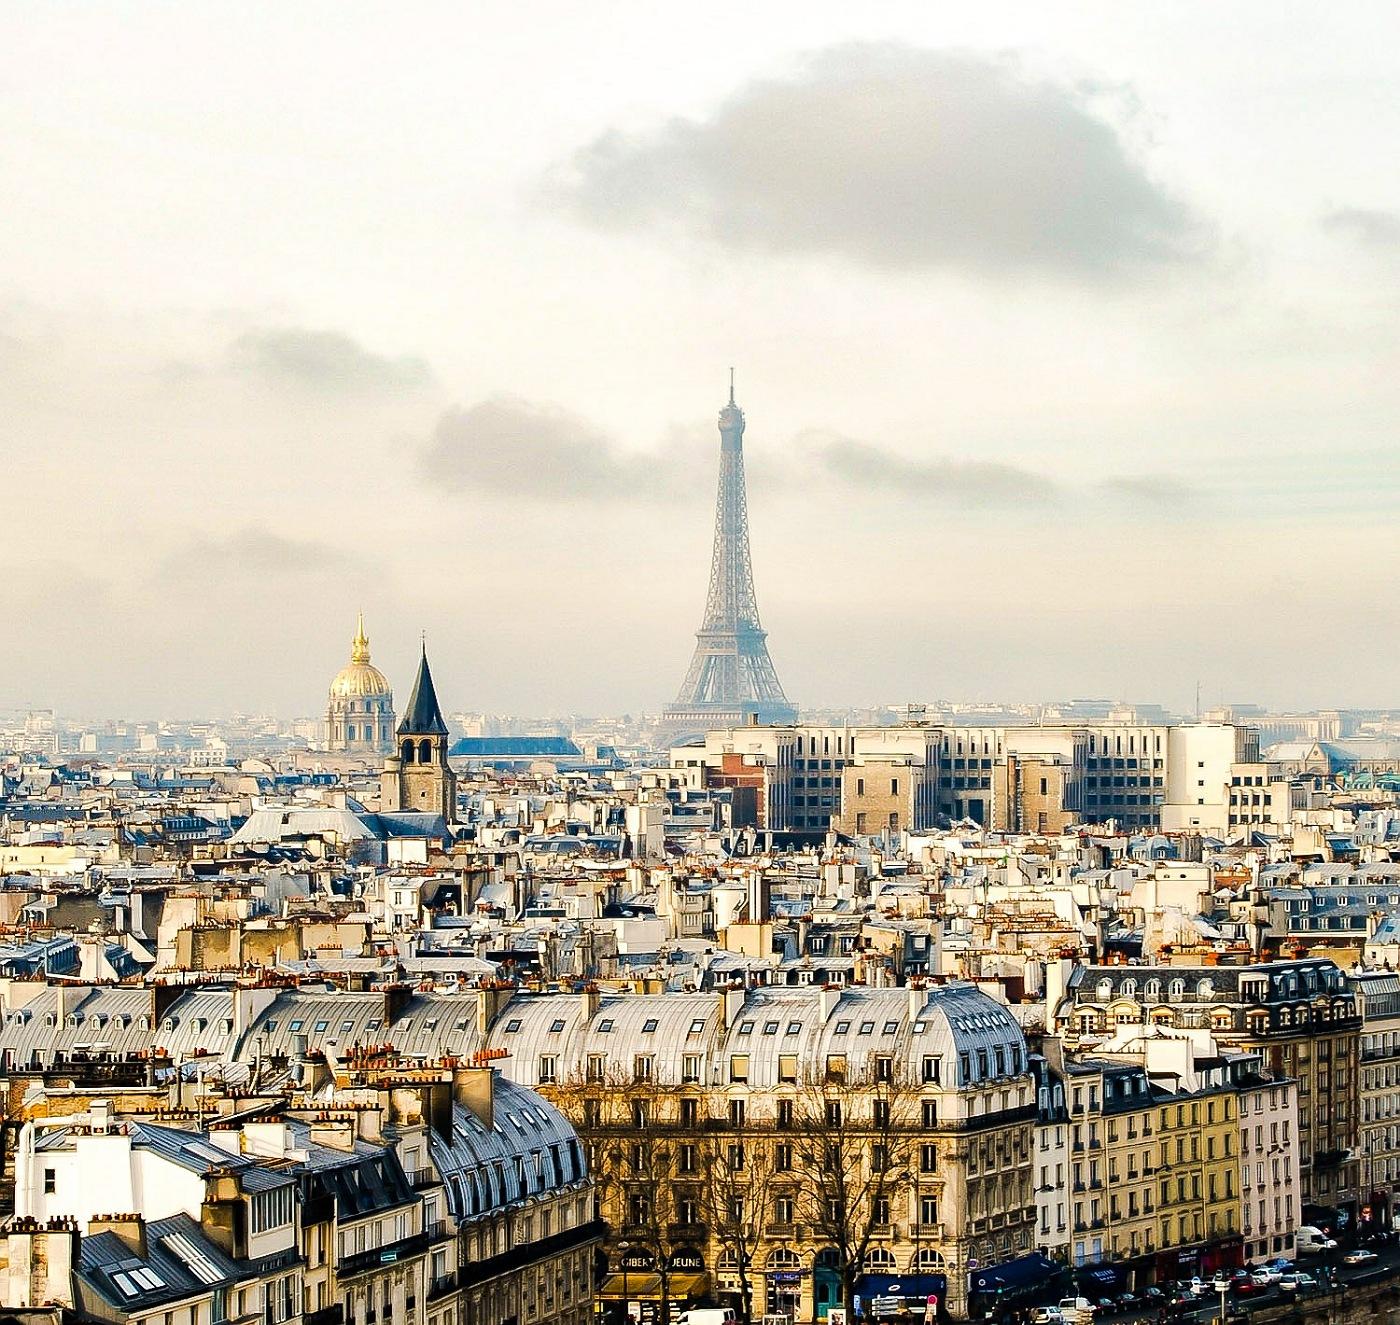 viaggincucina intervista parigi blog viaggi